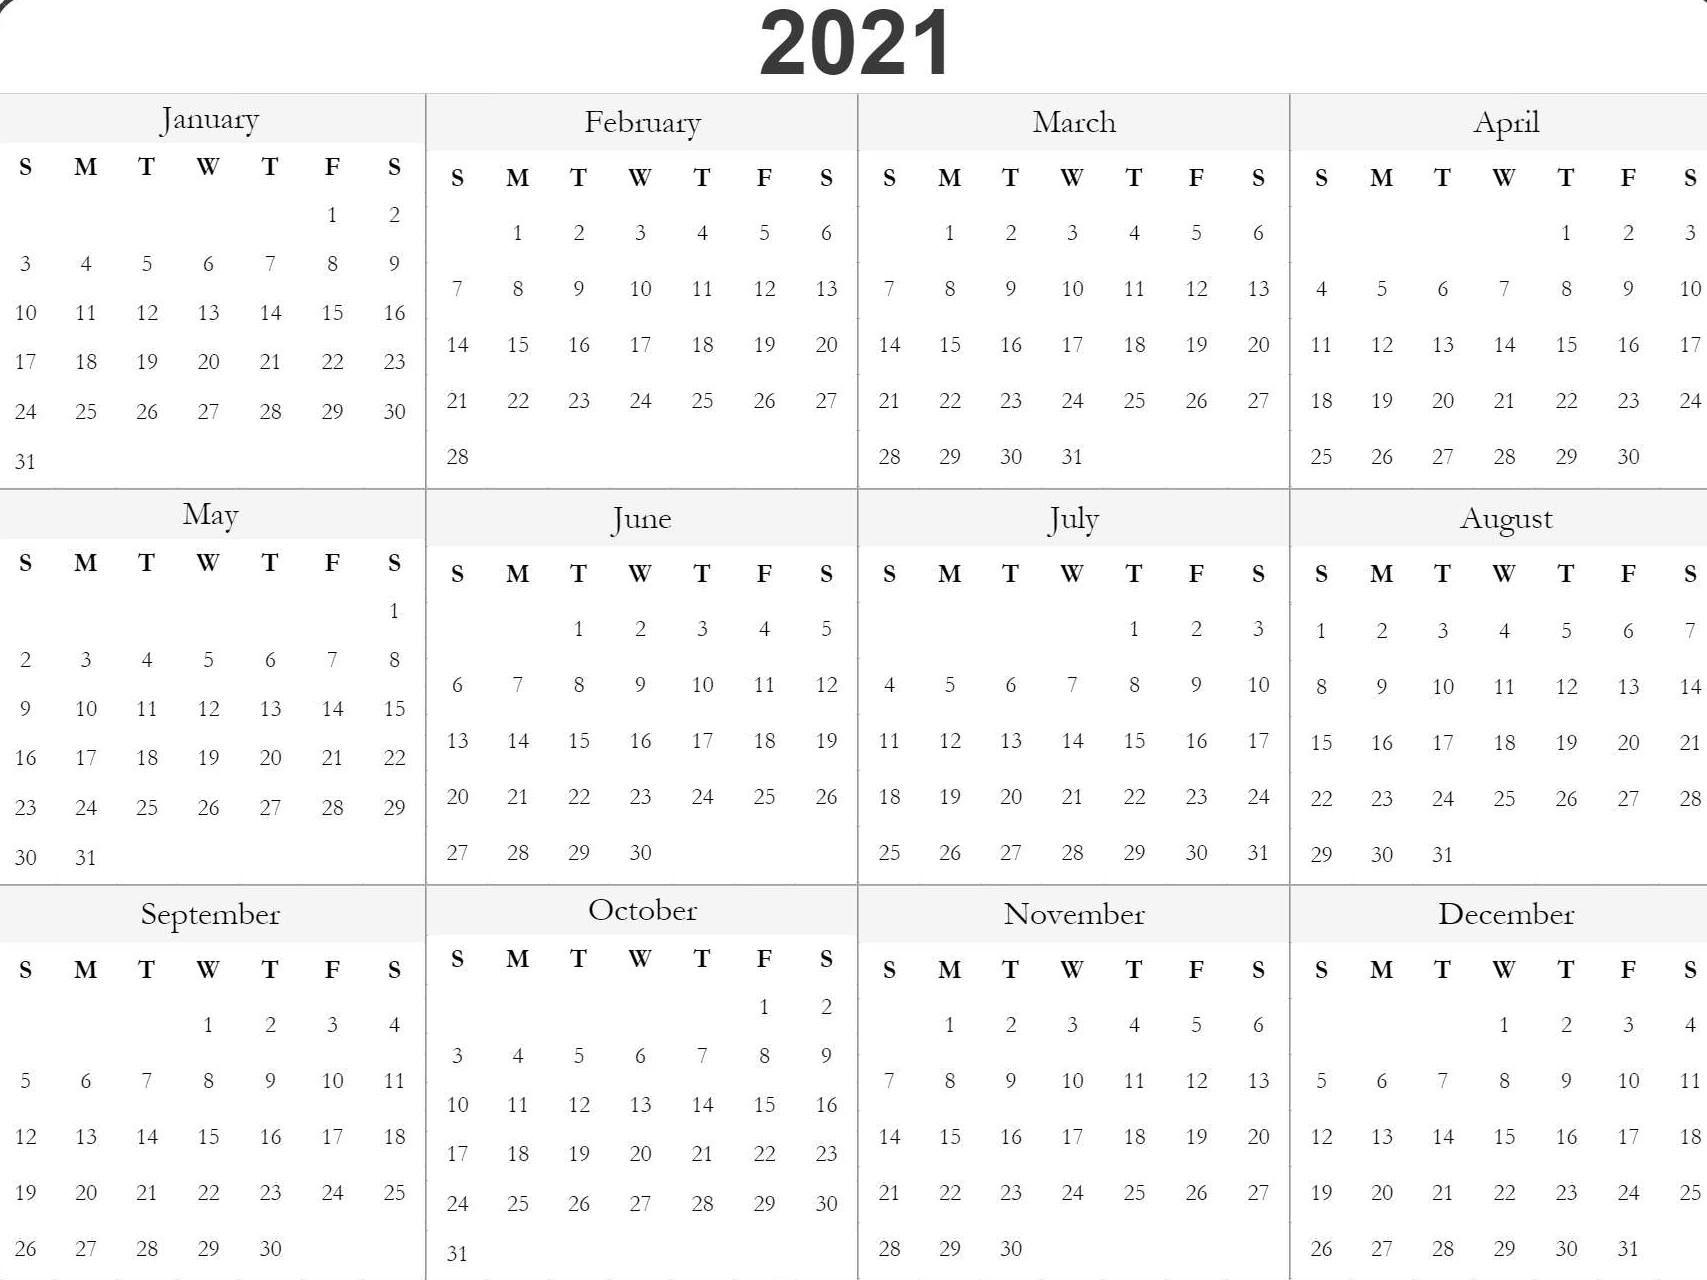 Blank Printable 2021 Calendar Template In 2020 | Free inside 2021 Calendar To Fill In